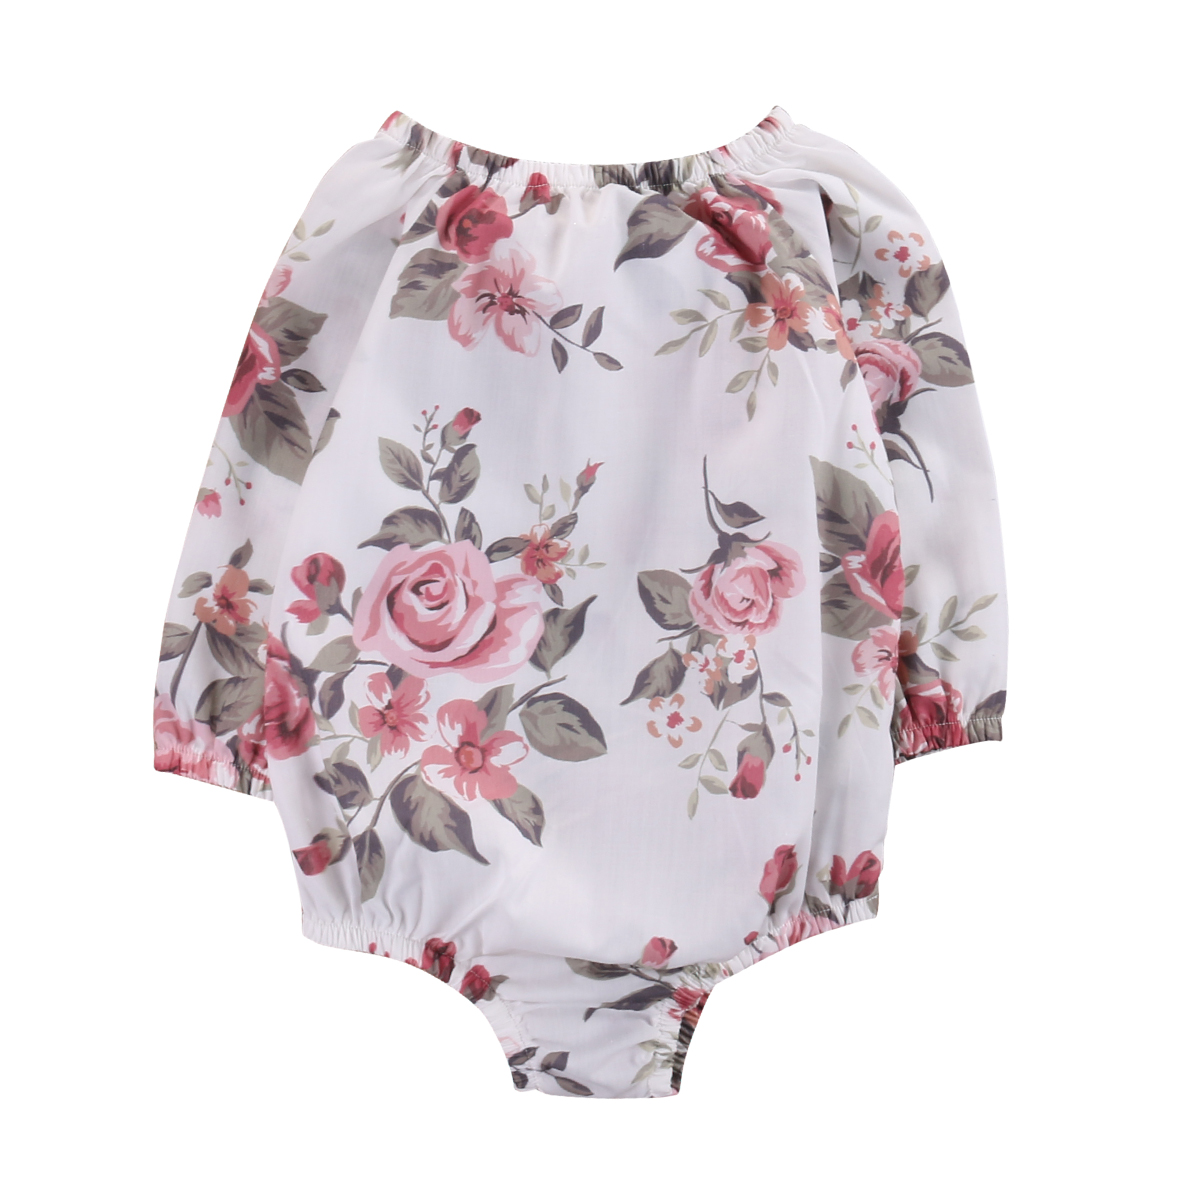 Hi Hi Baby Store Cute Summer Newborn Baby Girls Long Sleeves Folar Print Cotton  Bodysuit 0-18 M